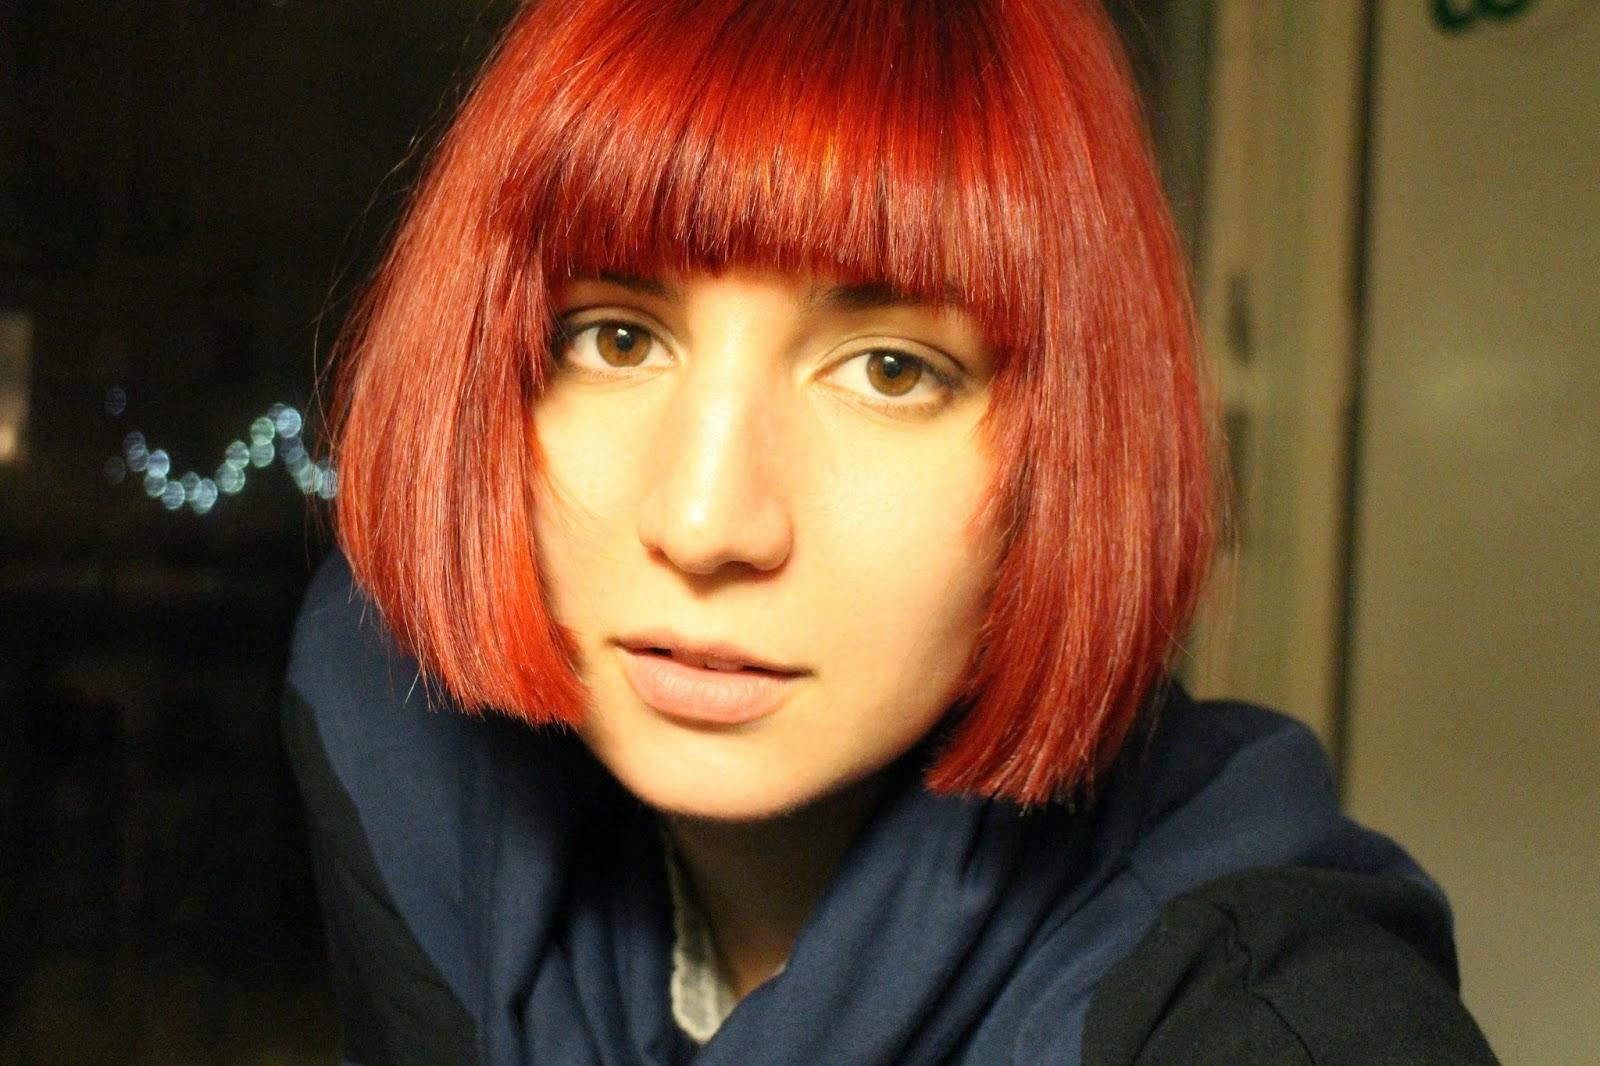 red pageboy cut, sci-fi hair, space station hair, Aveda puretone red, bob haircut, shattered bangs, ruby colored hair, jewel-tone hair, stuffeddoggie